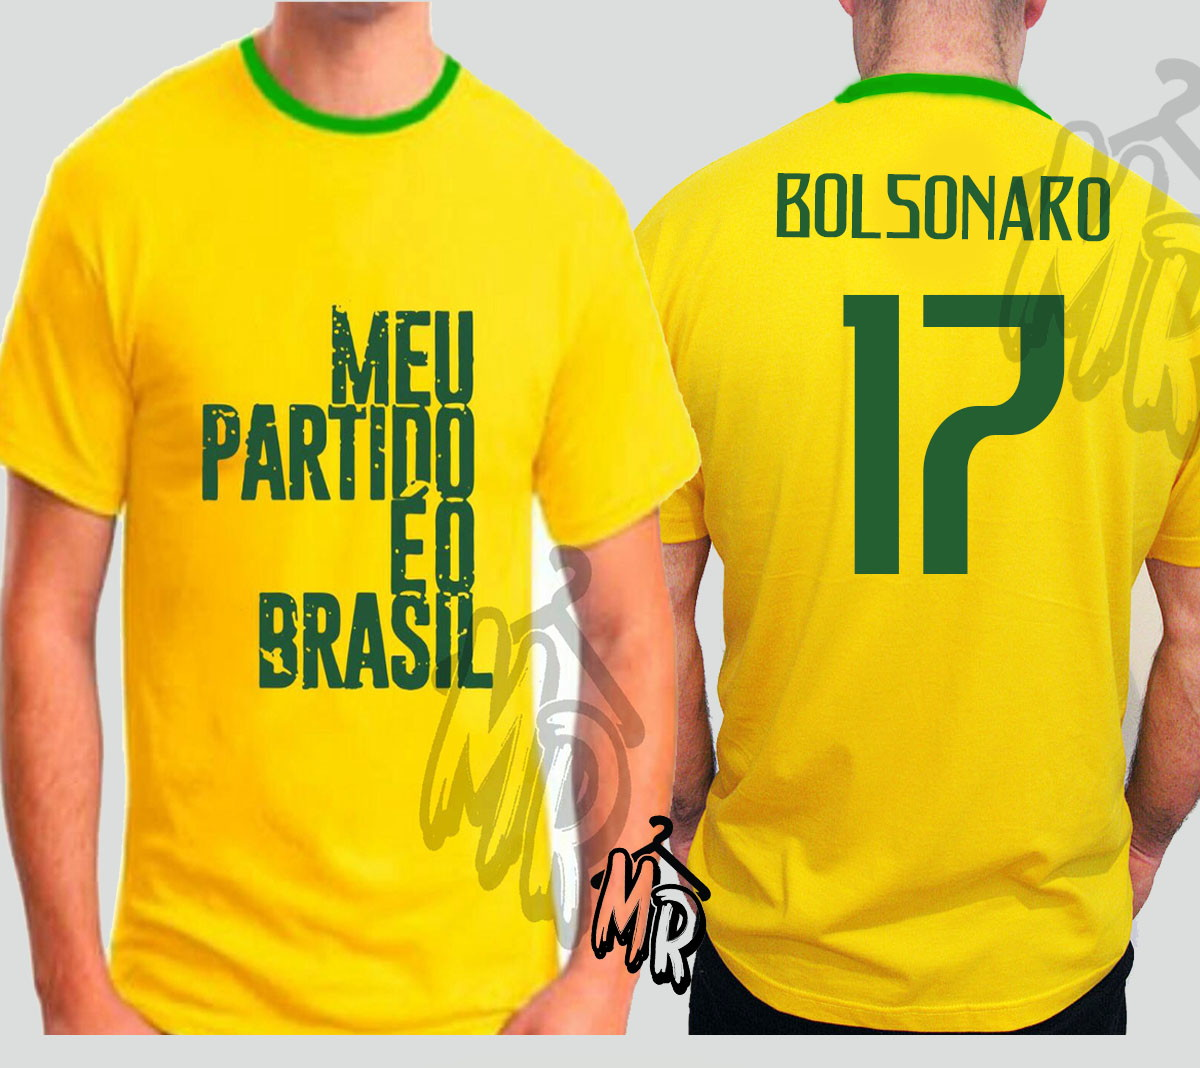 Camiseta Bolsonaro Presidente 2018 Meu Partido e o Brasil  8f0e1b182bf09